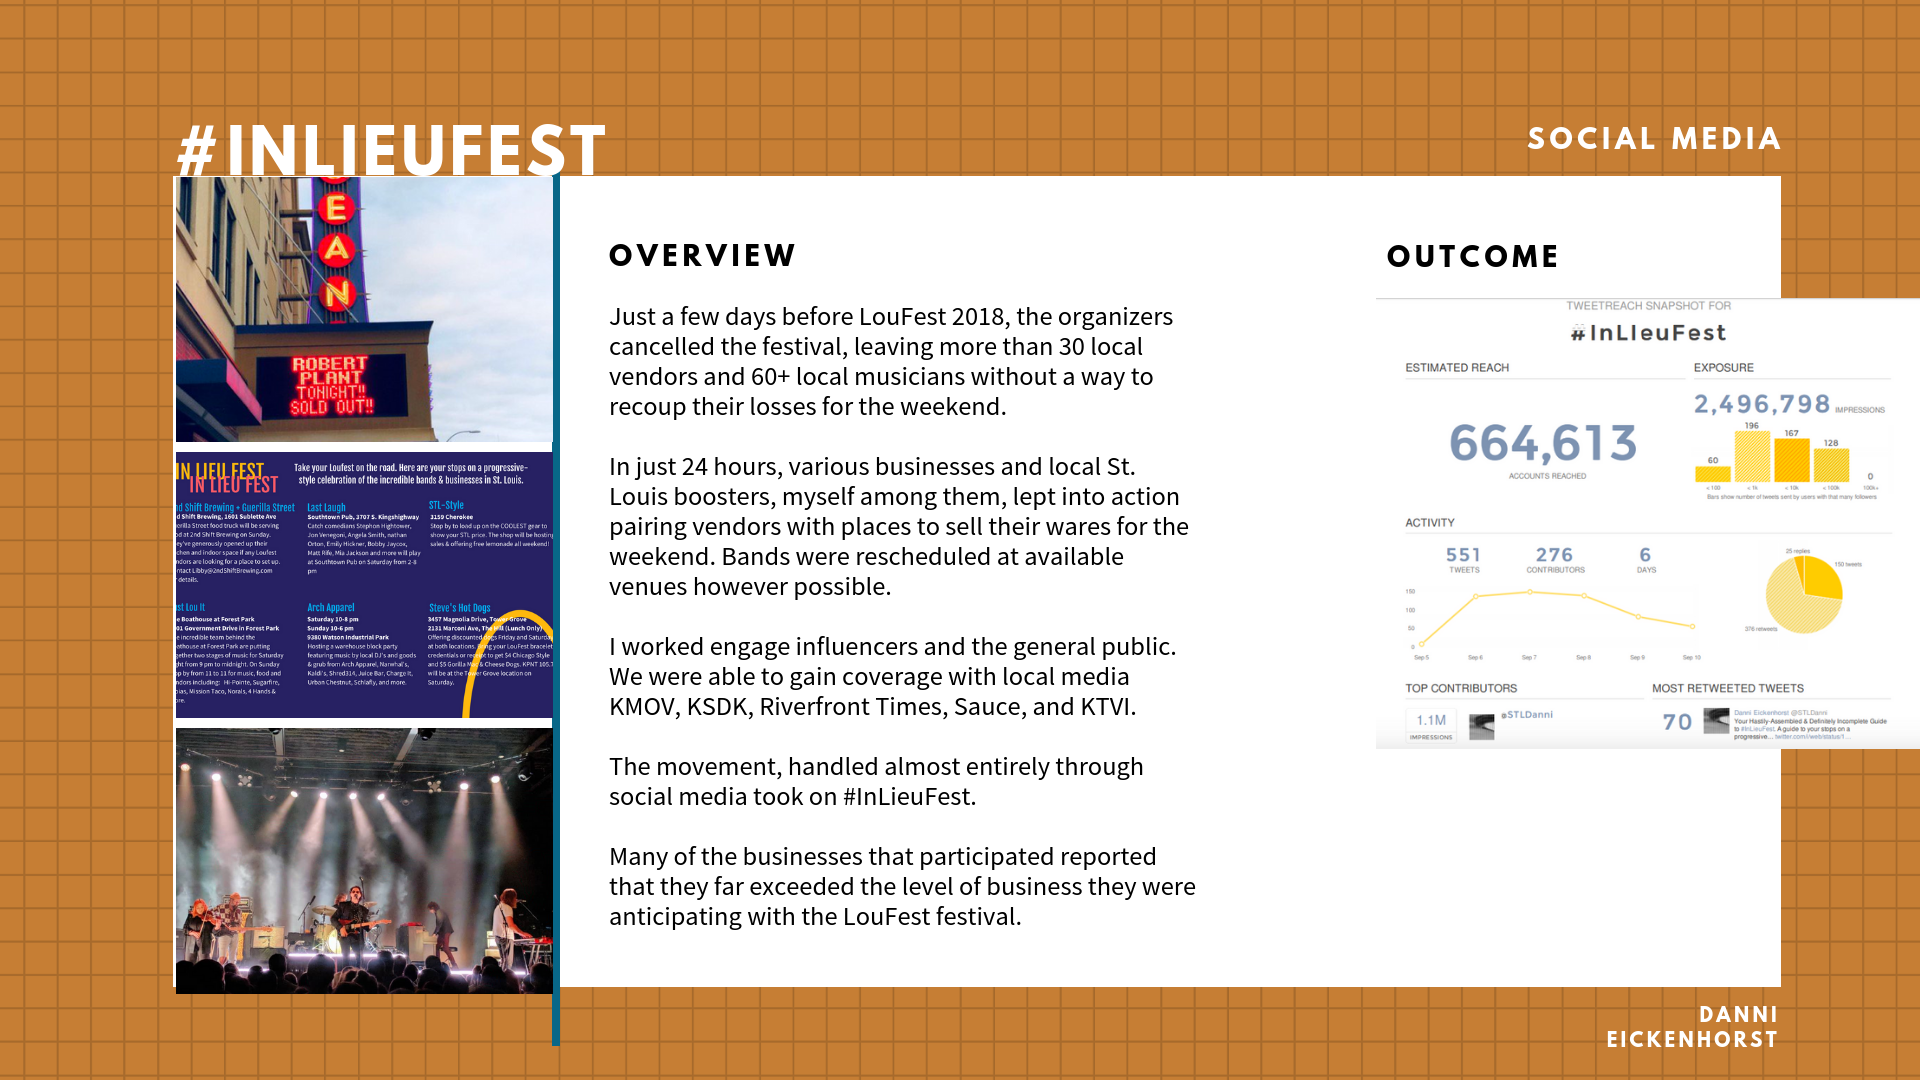 InLieuFest LouFest Social Media Case Study.png